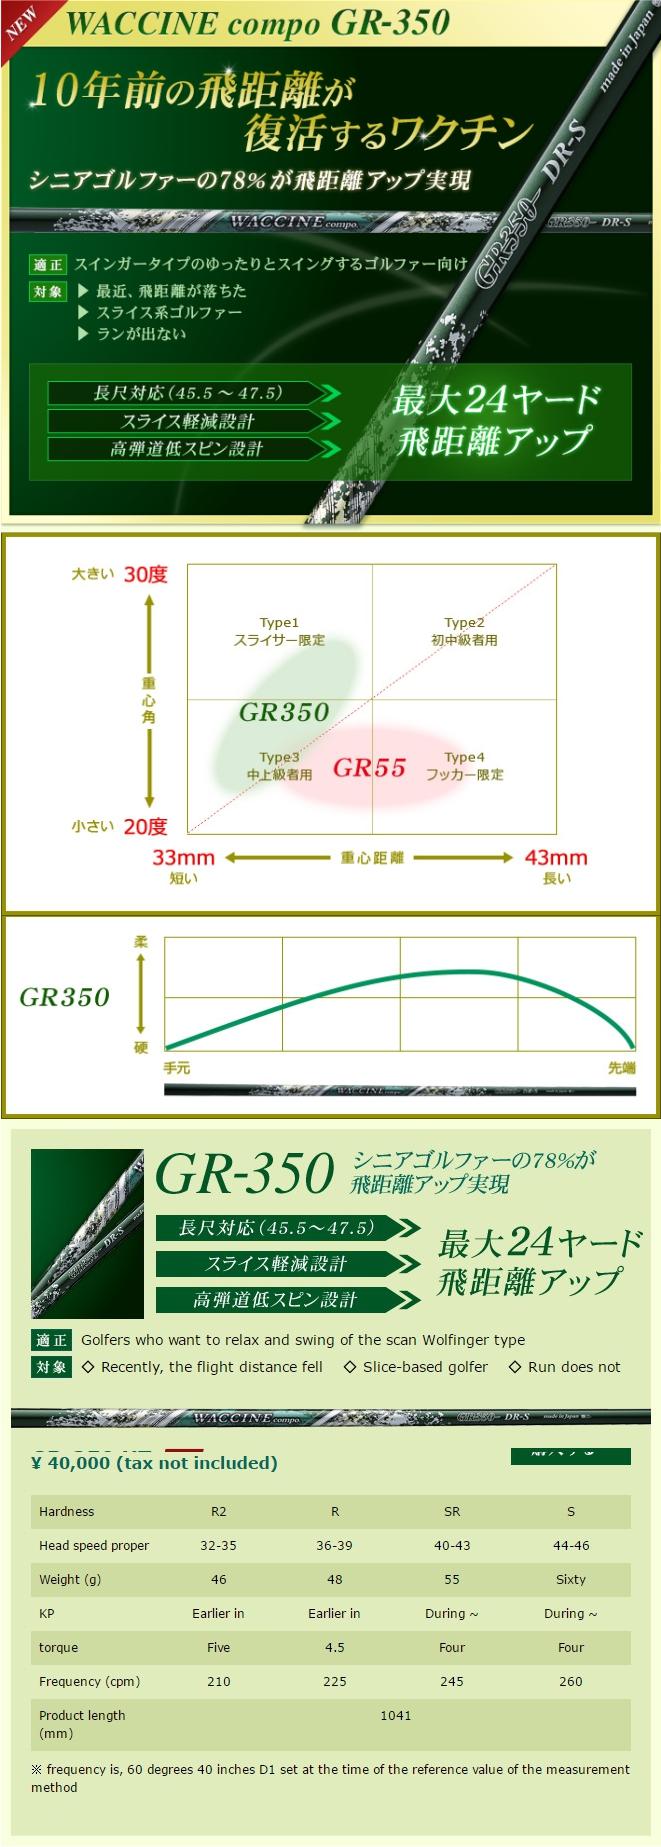 Waccine Compo GR-350 Utility Shaft